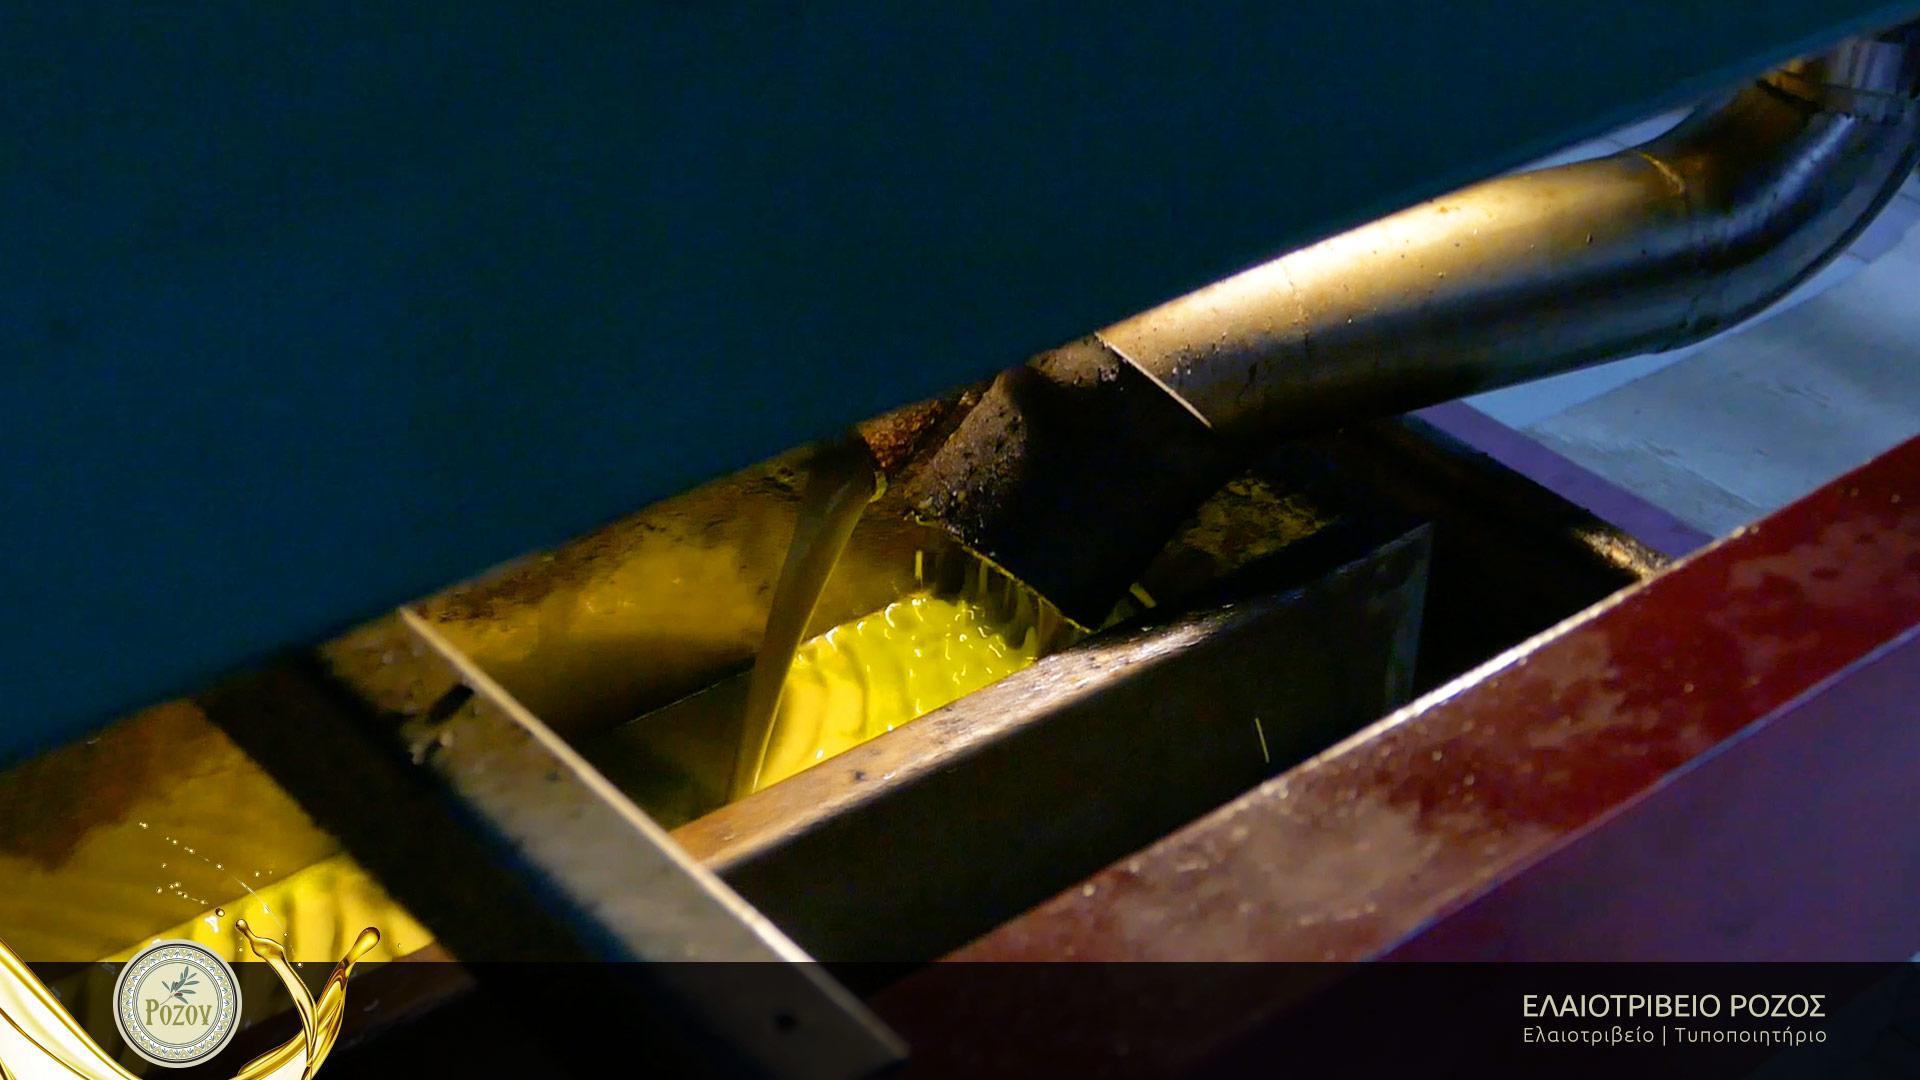 Rozos Oil Ελαιοτριβείο Τυποποιητήριο Αχαΐας